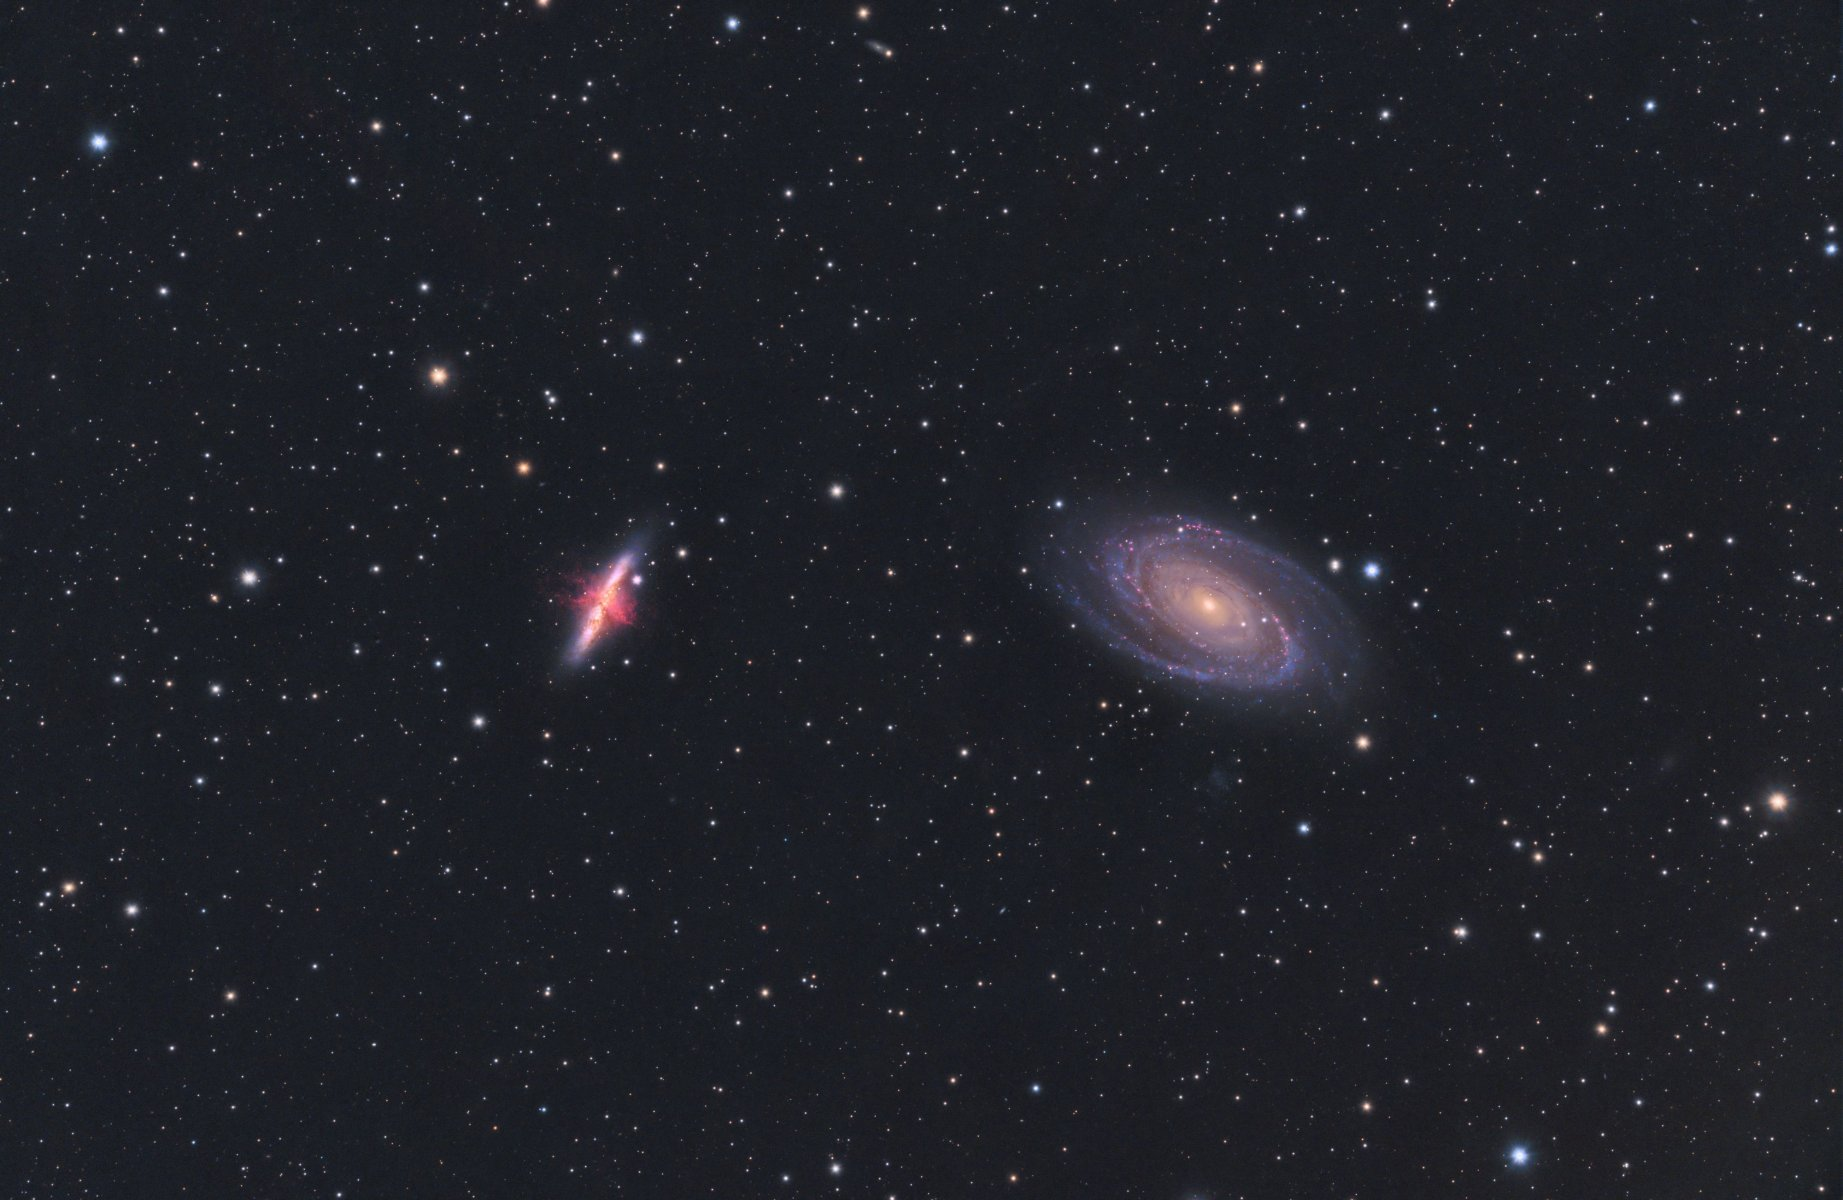 M81_M82_LRGBHa_edit3db_web.jpg